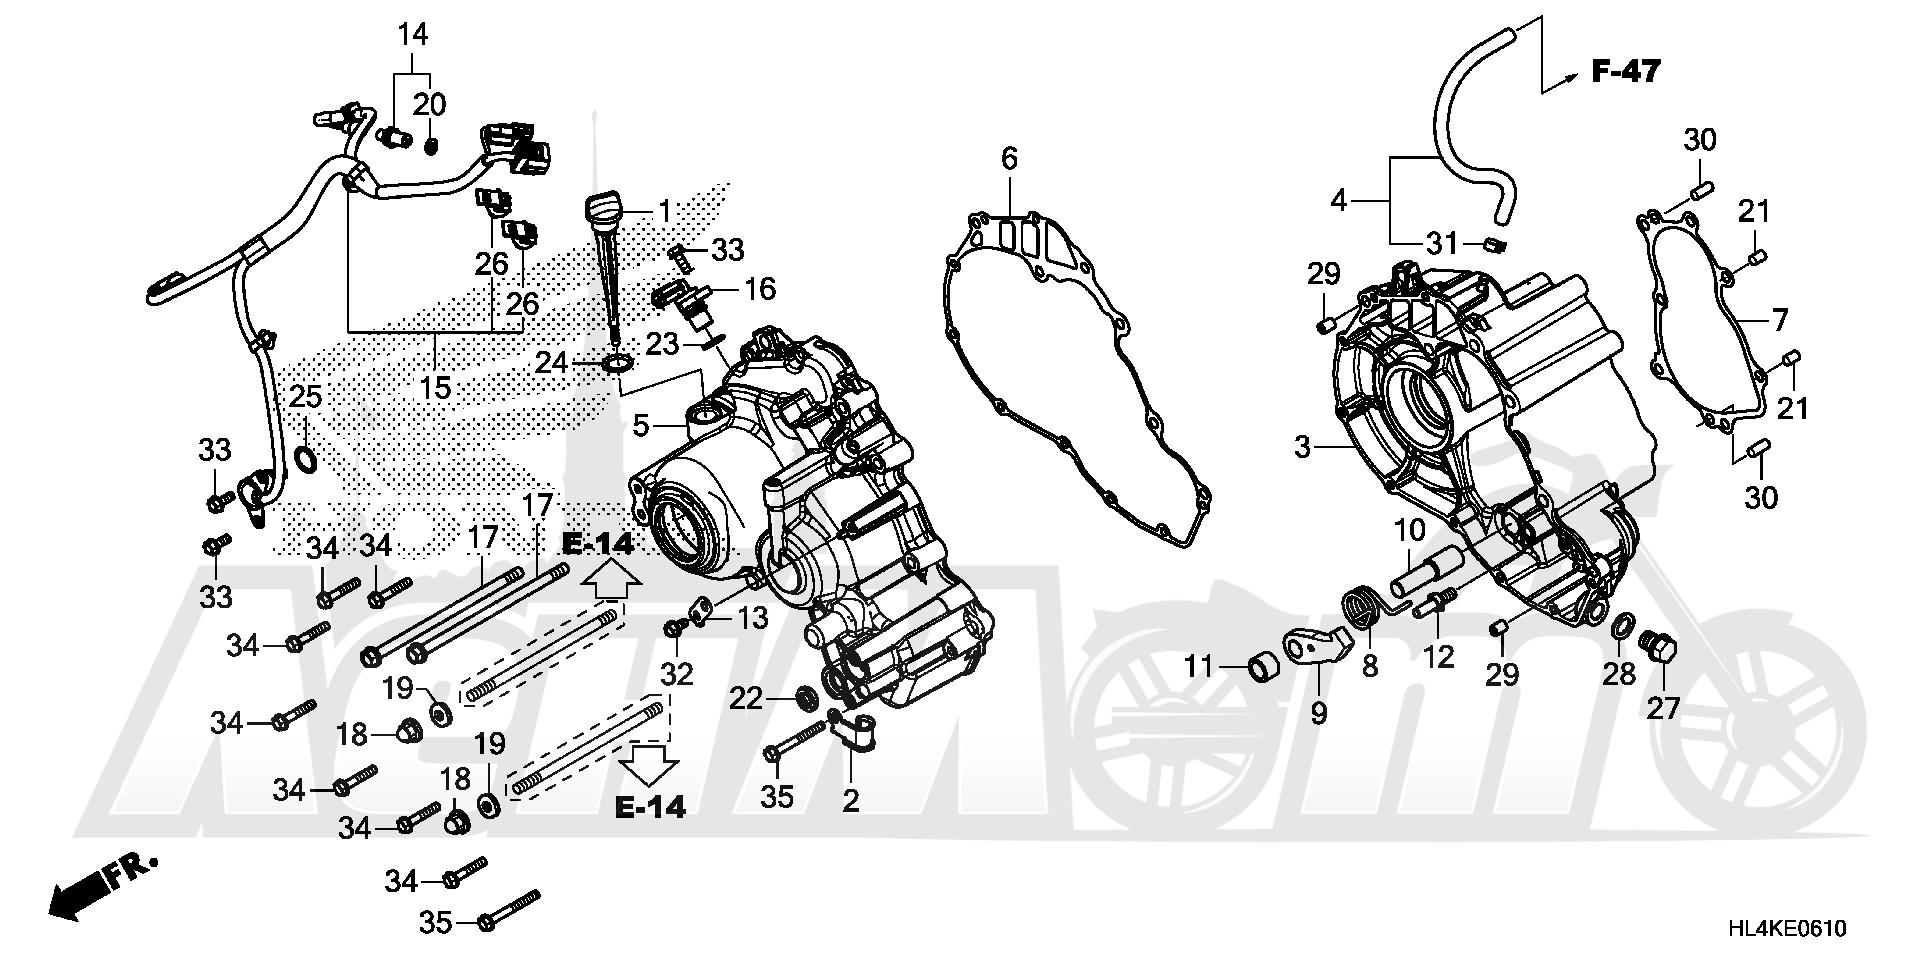 Запчасти для Квадроцикла Honda 2019 SXS1000M5L Раздел: SUB-TRANSMISSION CASE | SUB трансмиссия корпус